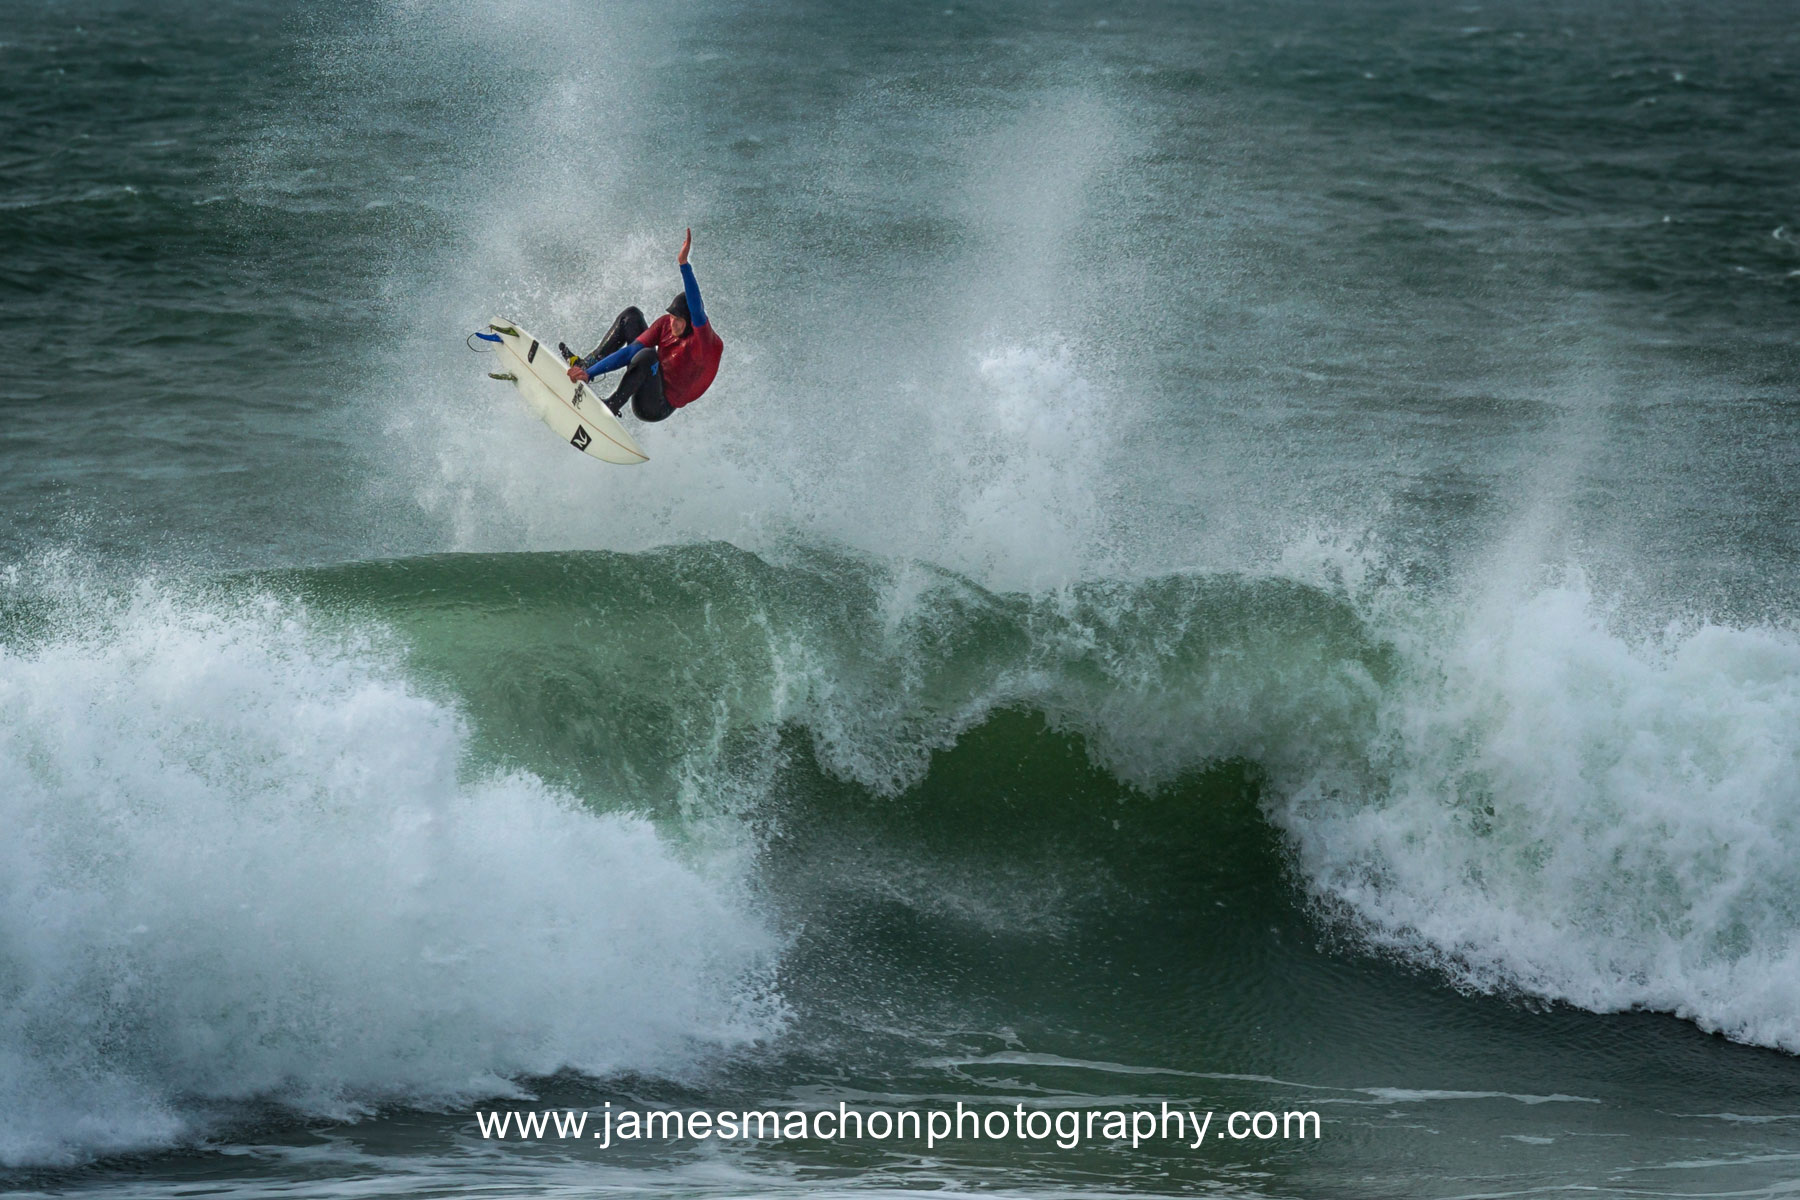 James Machon